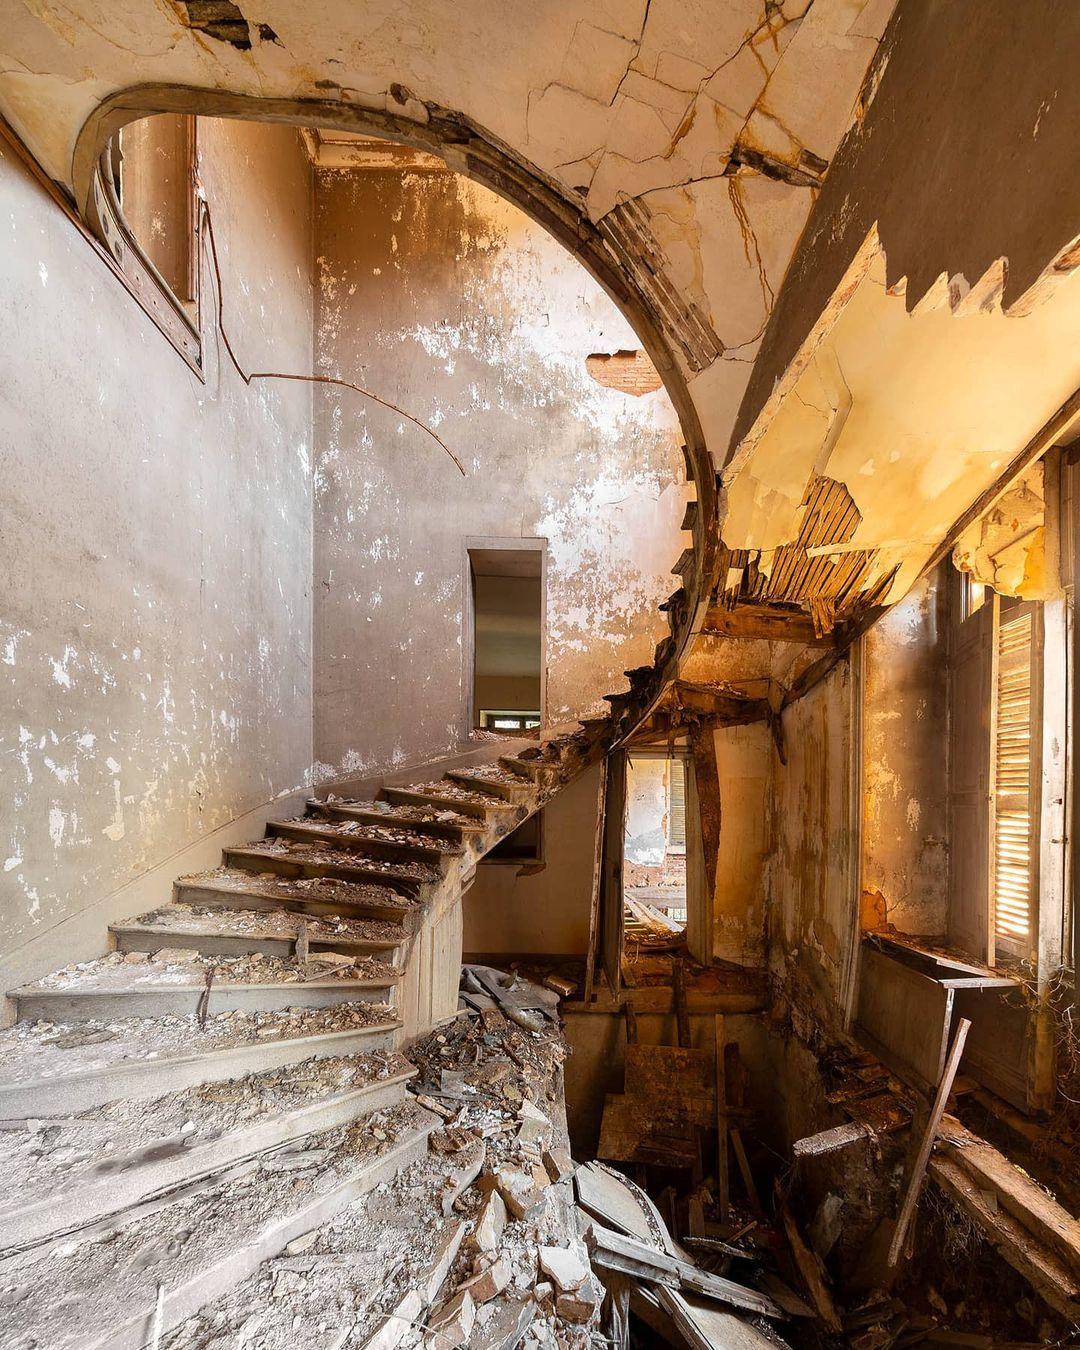 Красота заброшенных мест на снимках Дмитрия Буррио